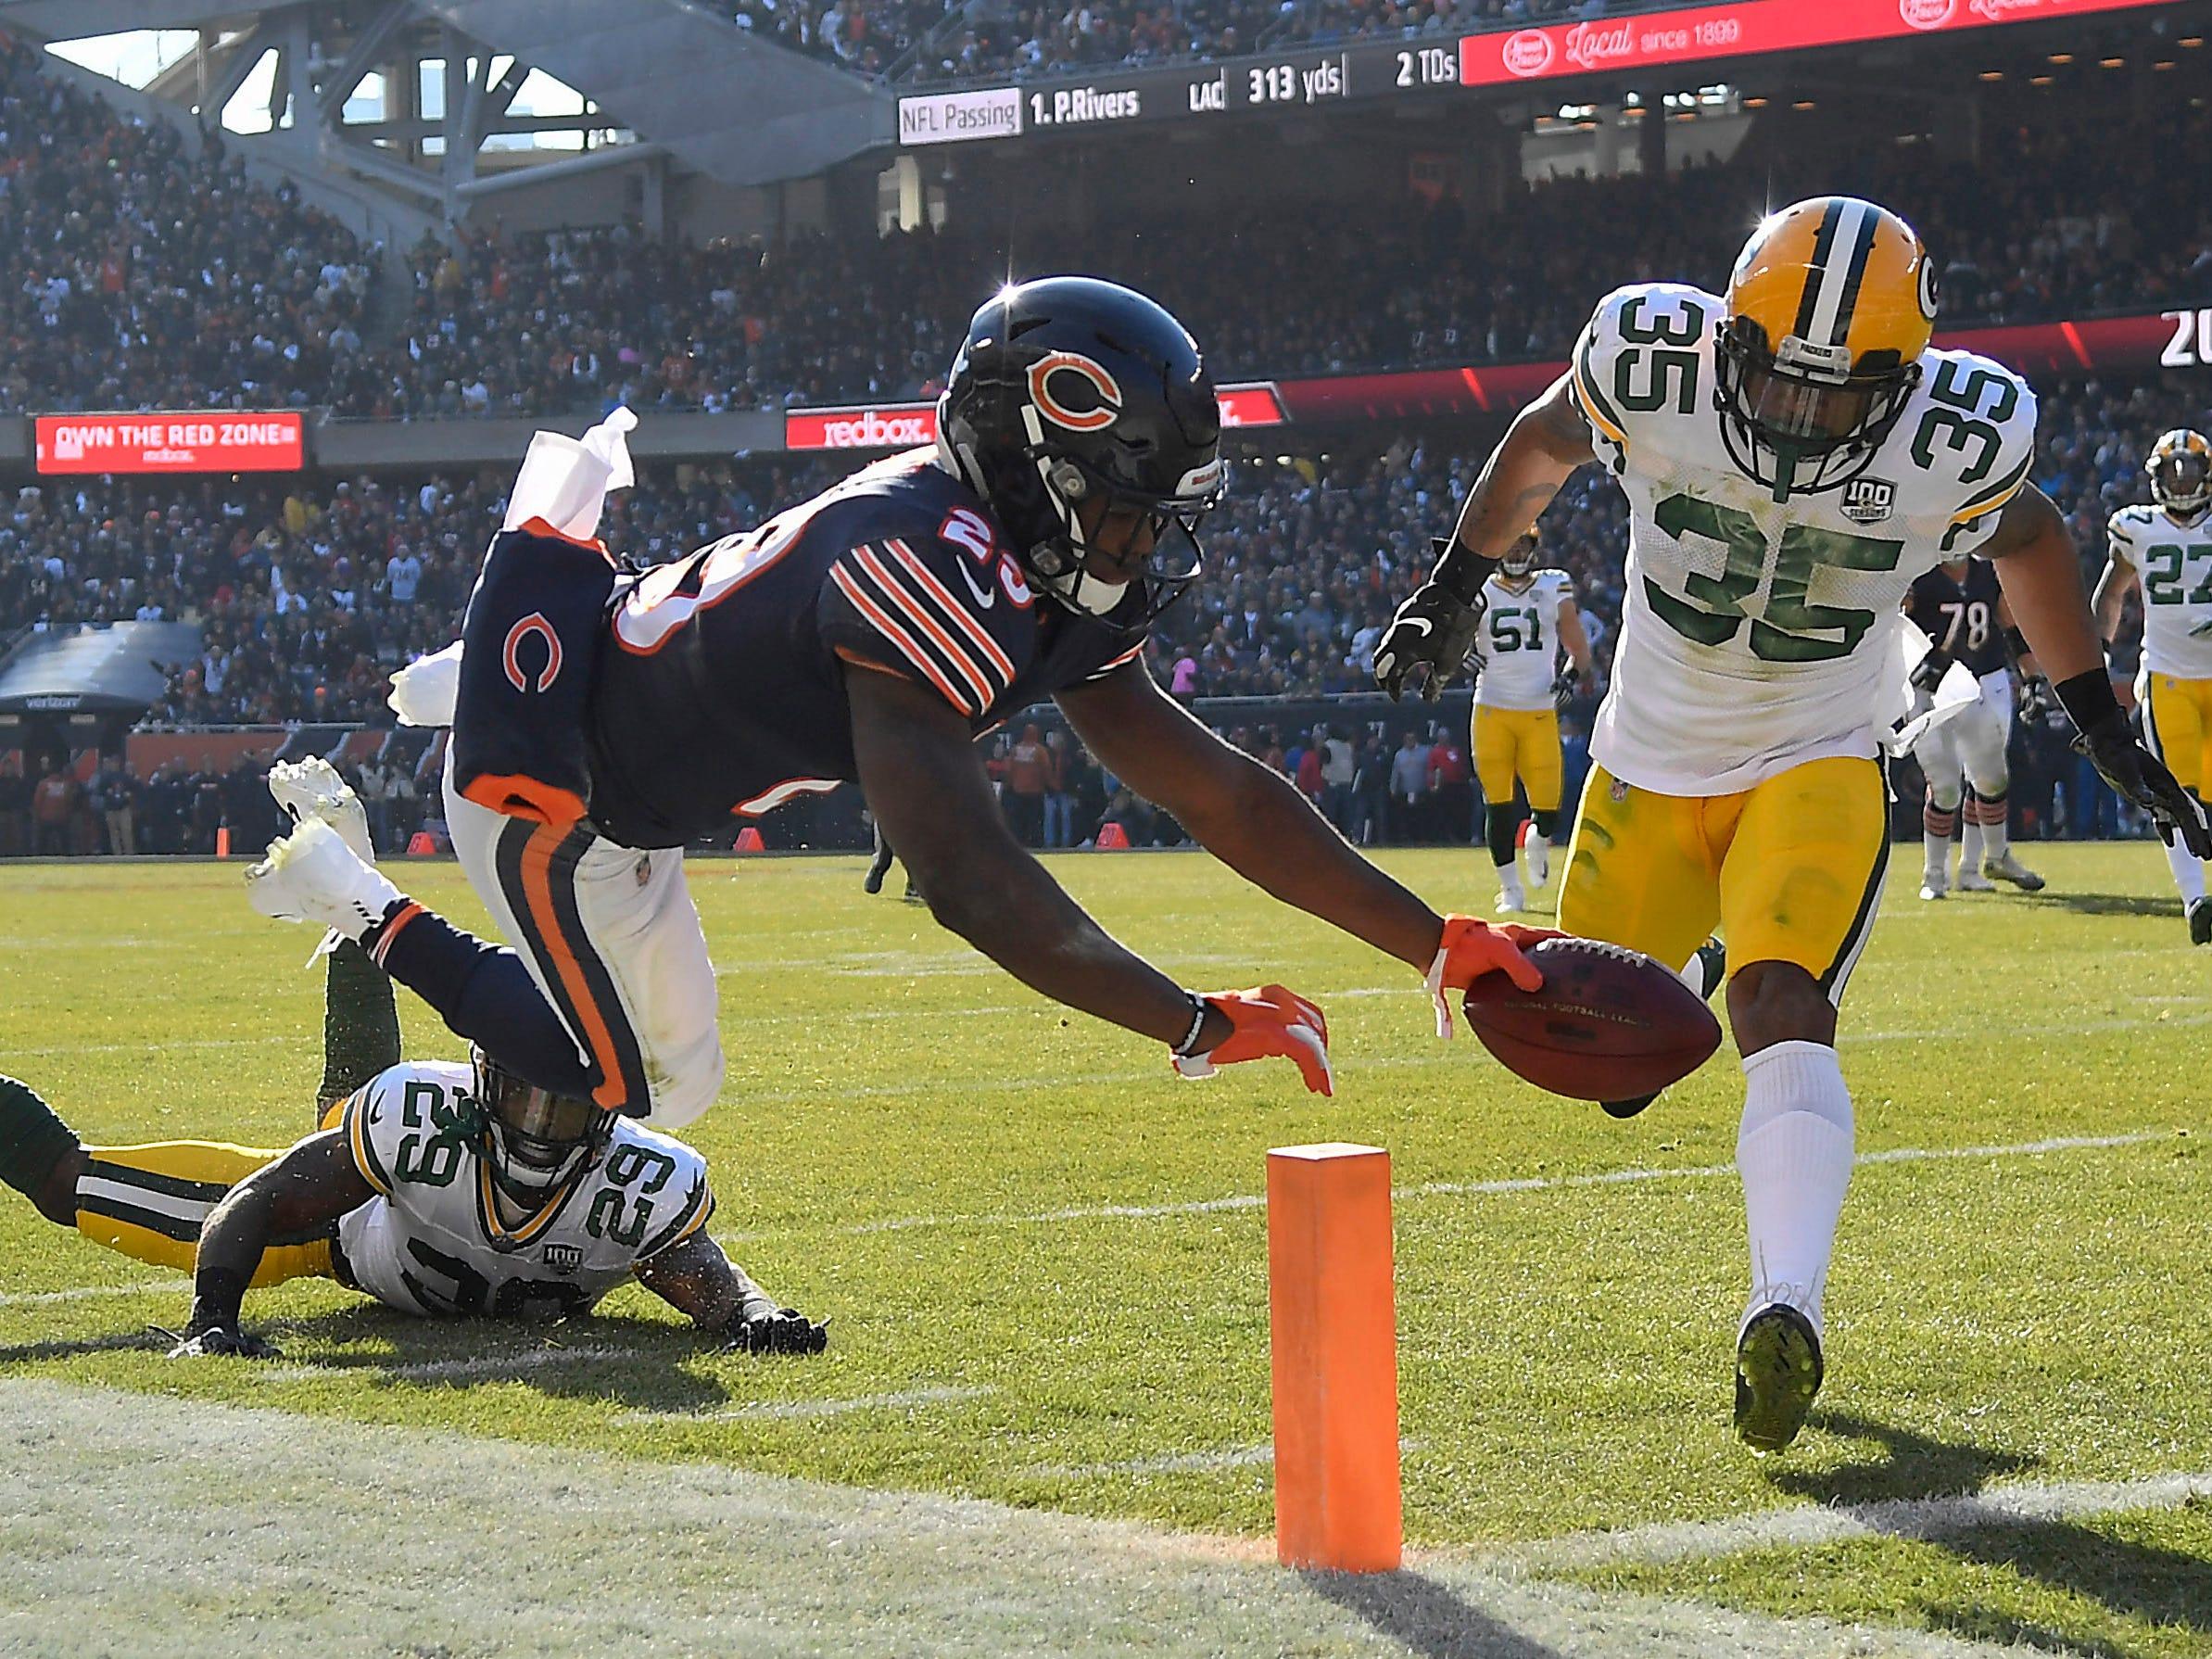 Bears running back Tarik Cohen (29) scores a touchdown against Packers defensive back Eddie Pleasant (35).